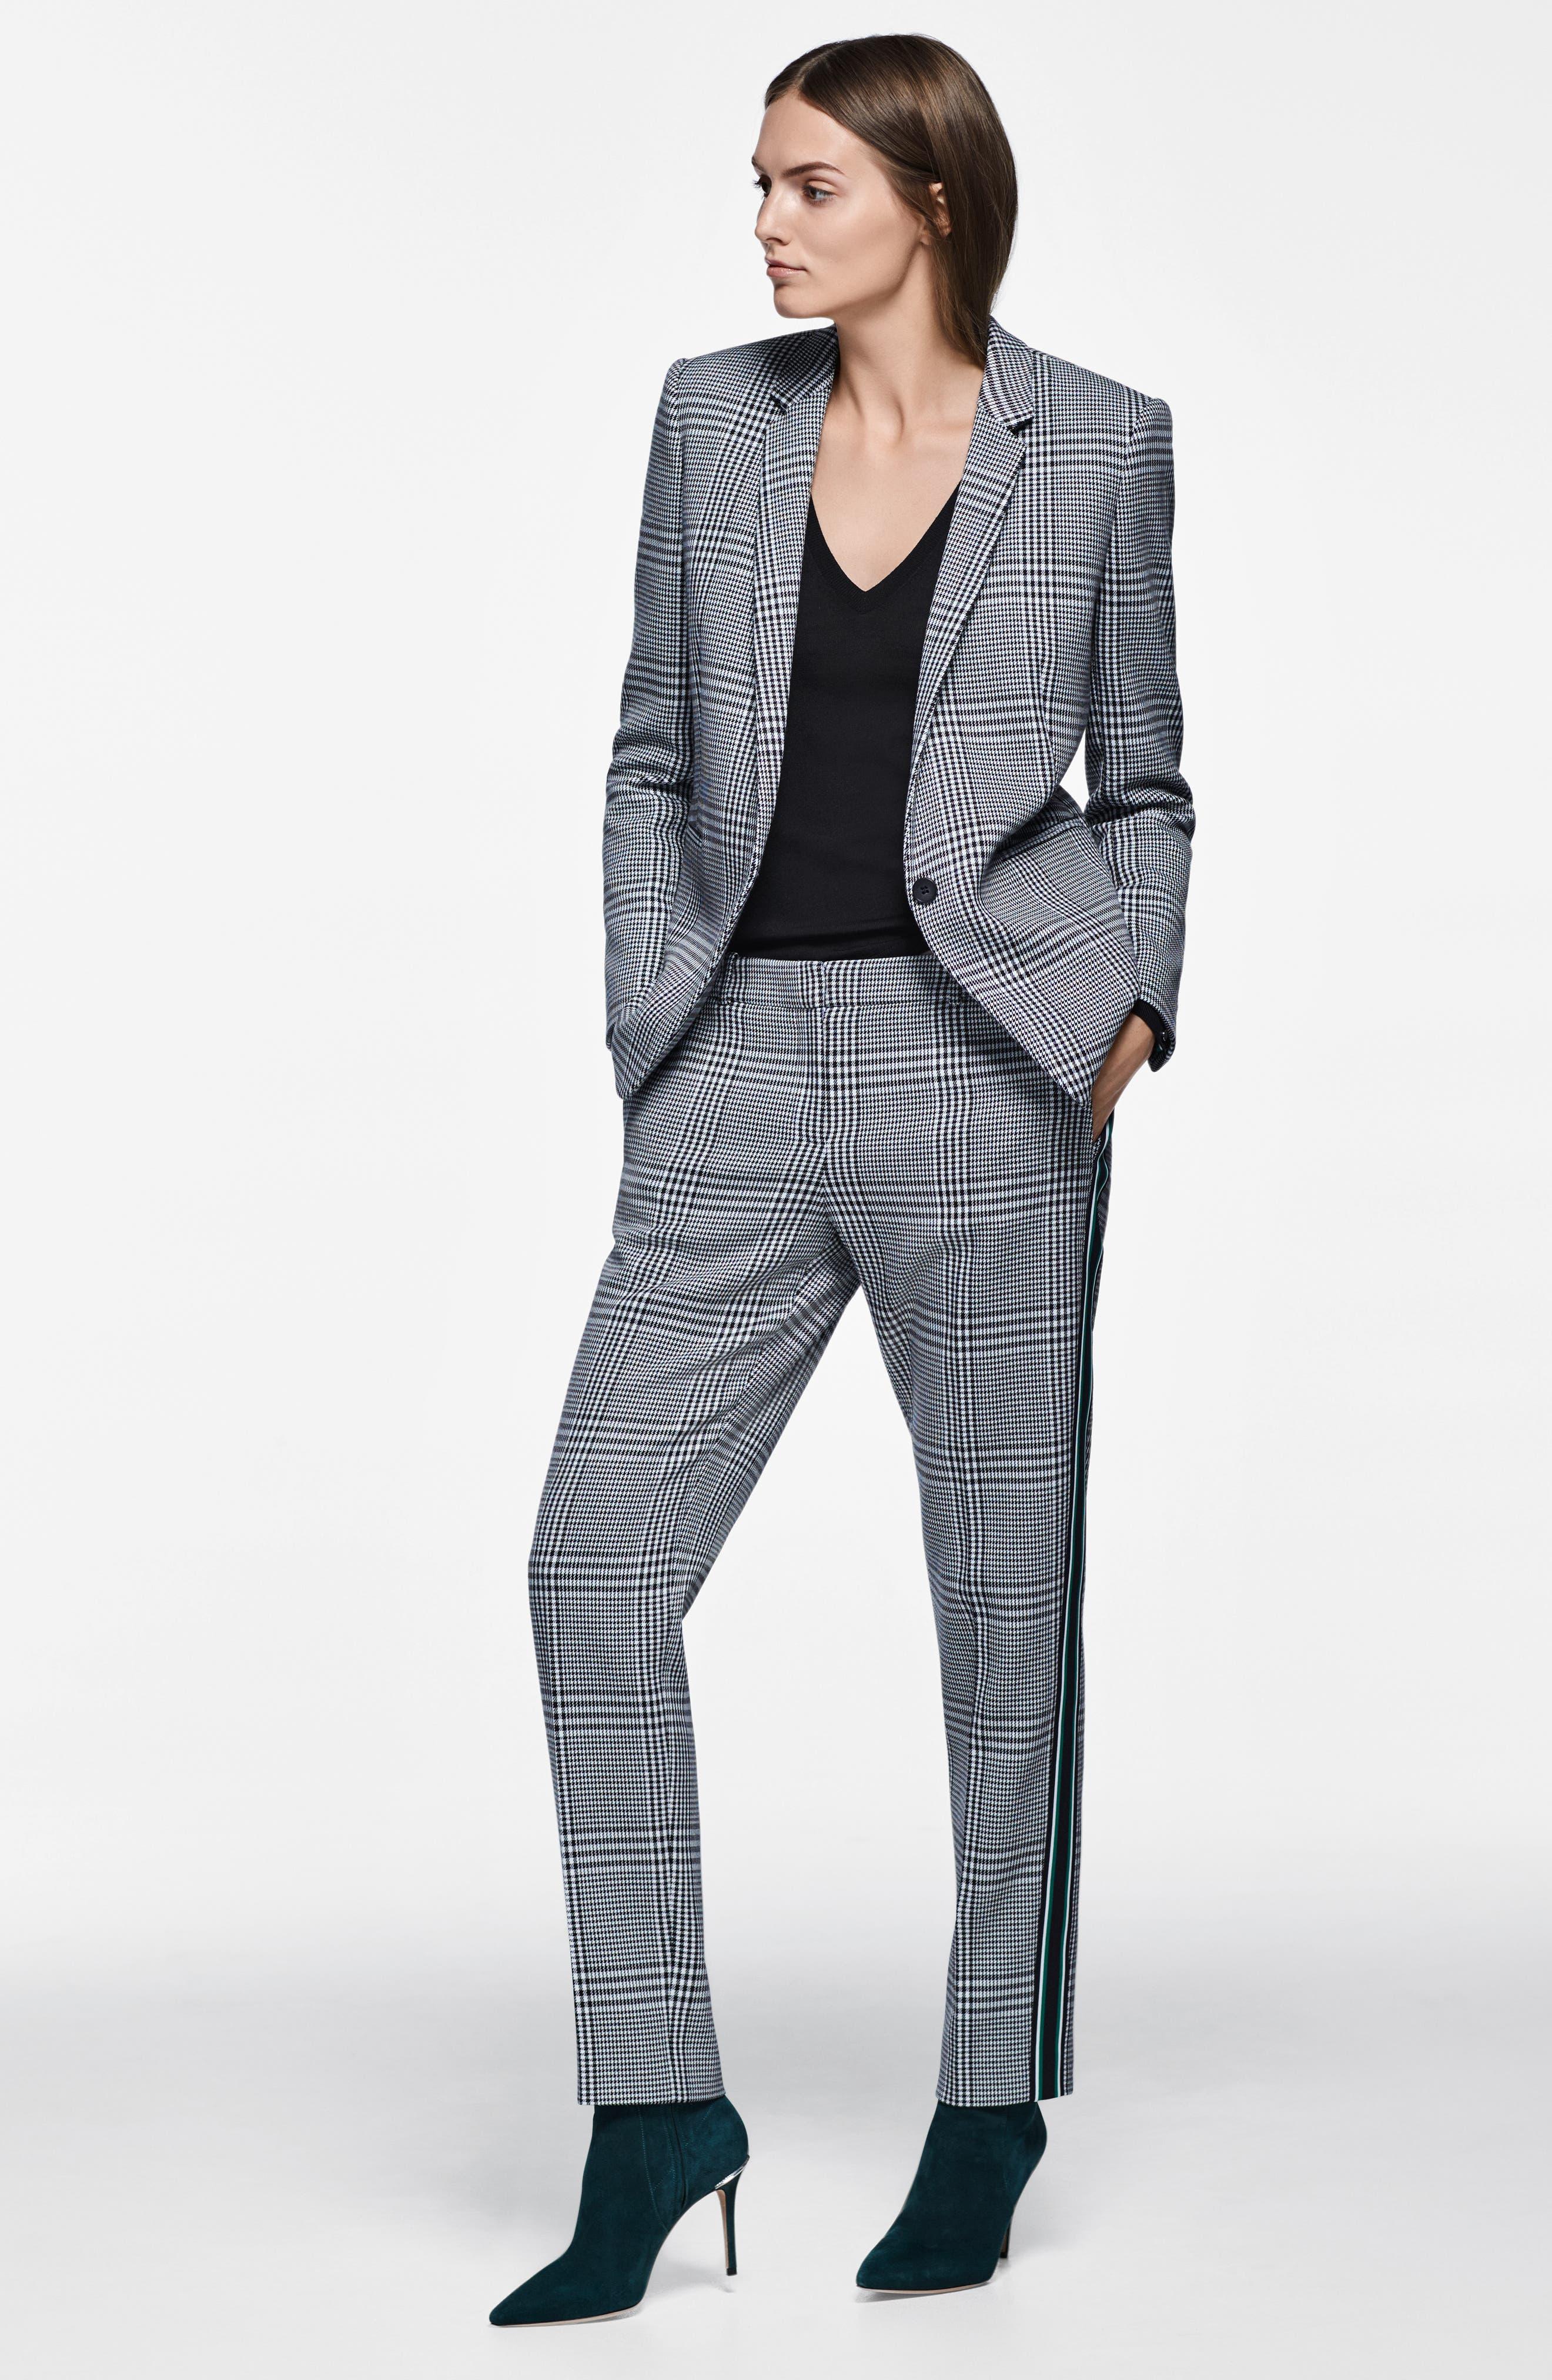 Jemaromina Glen Plaid Suit Jacket,                             Alternate thumbnail 8, color,                             GLENCHECK FANTASY